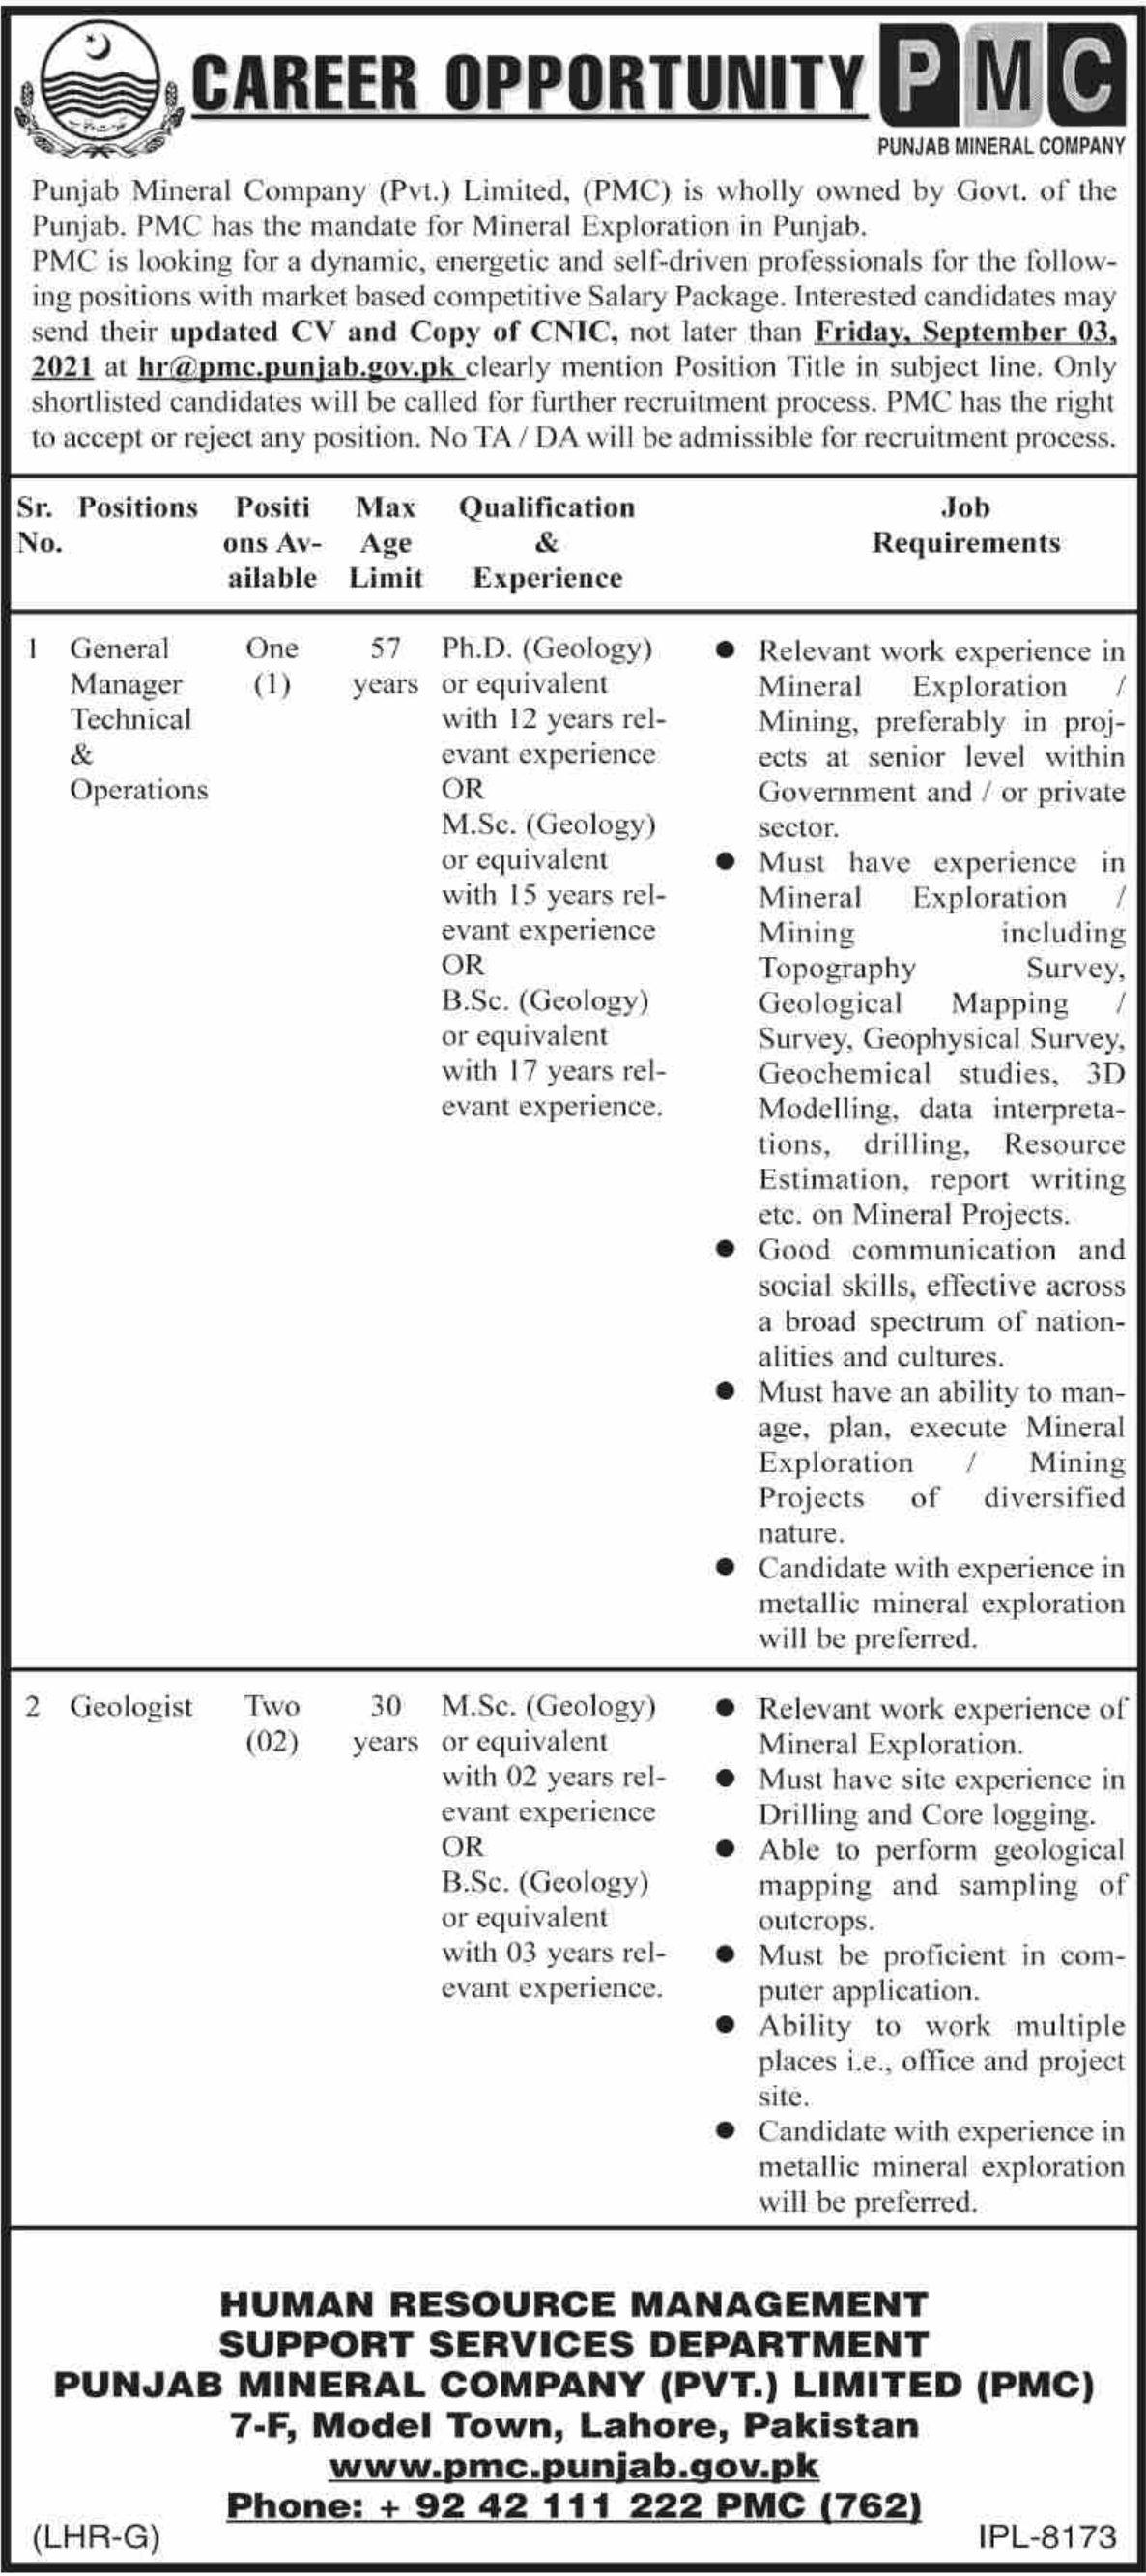 Punjab Mineral Company Pvt Limited PMC Vacancies 2021 2